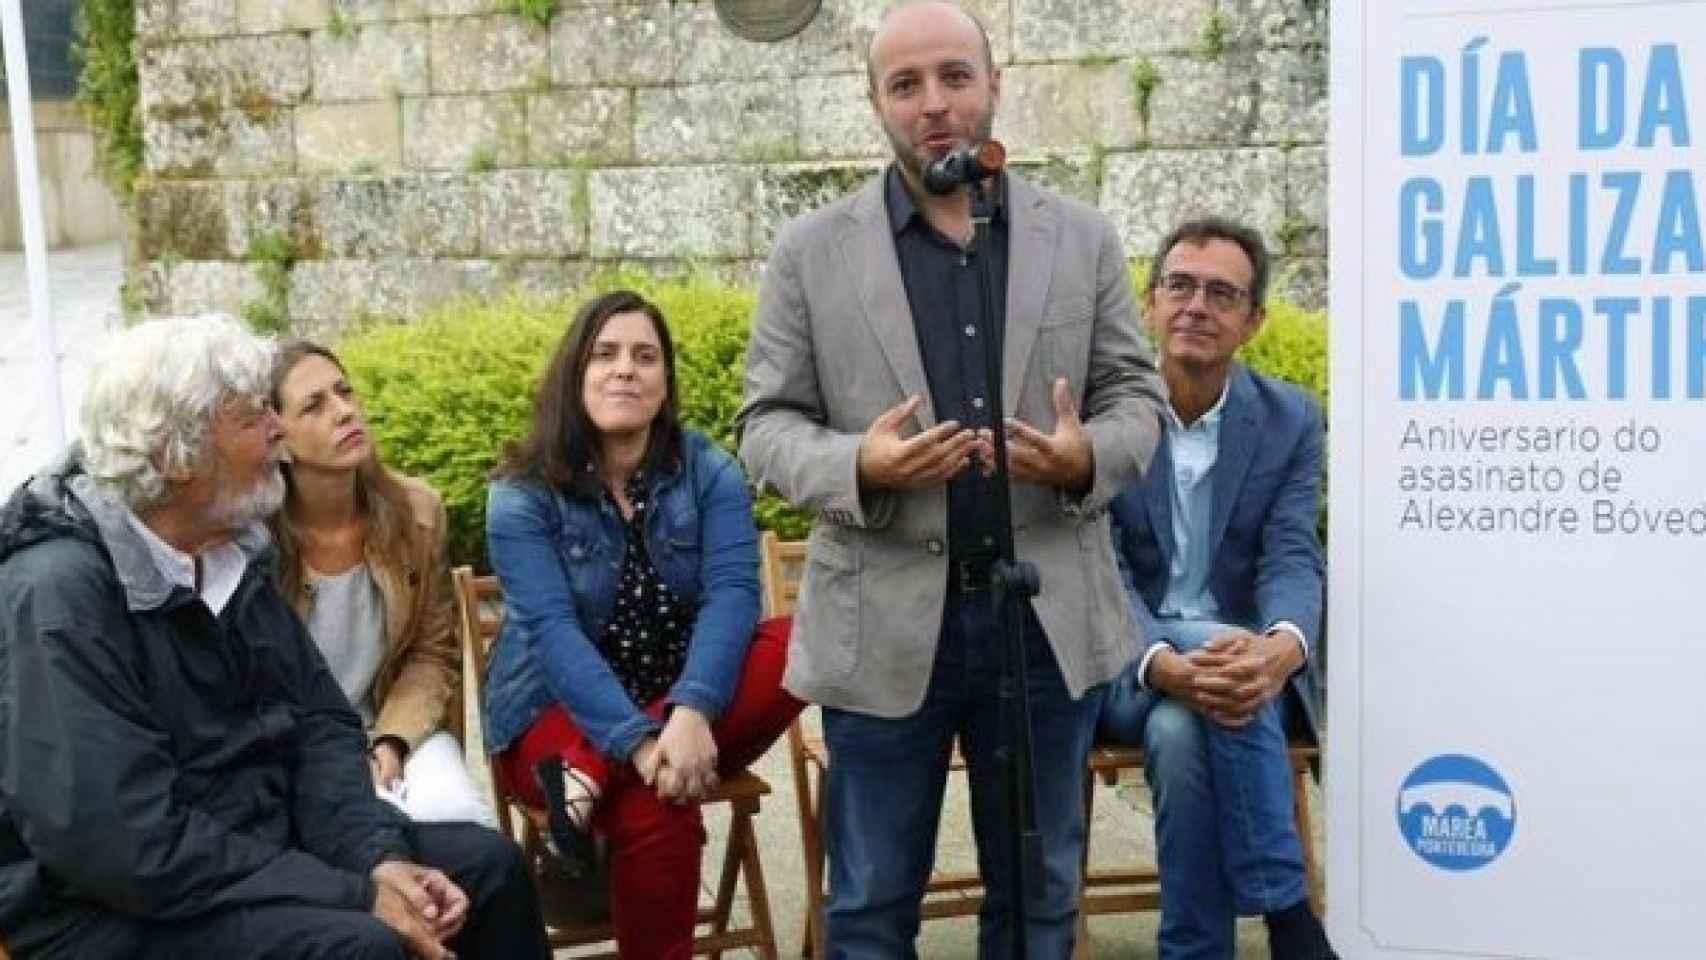 Beiras, referente del nacionalismo gallego, escucha a Luis Villares en un mitin